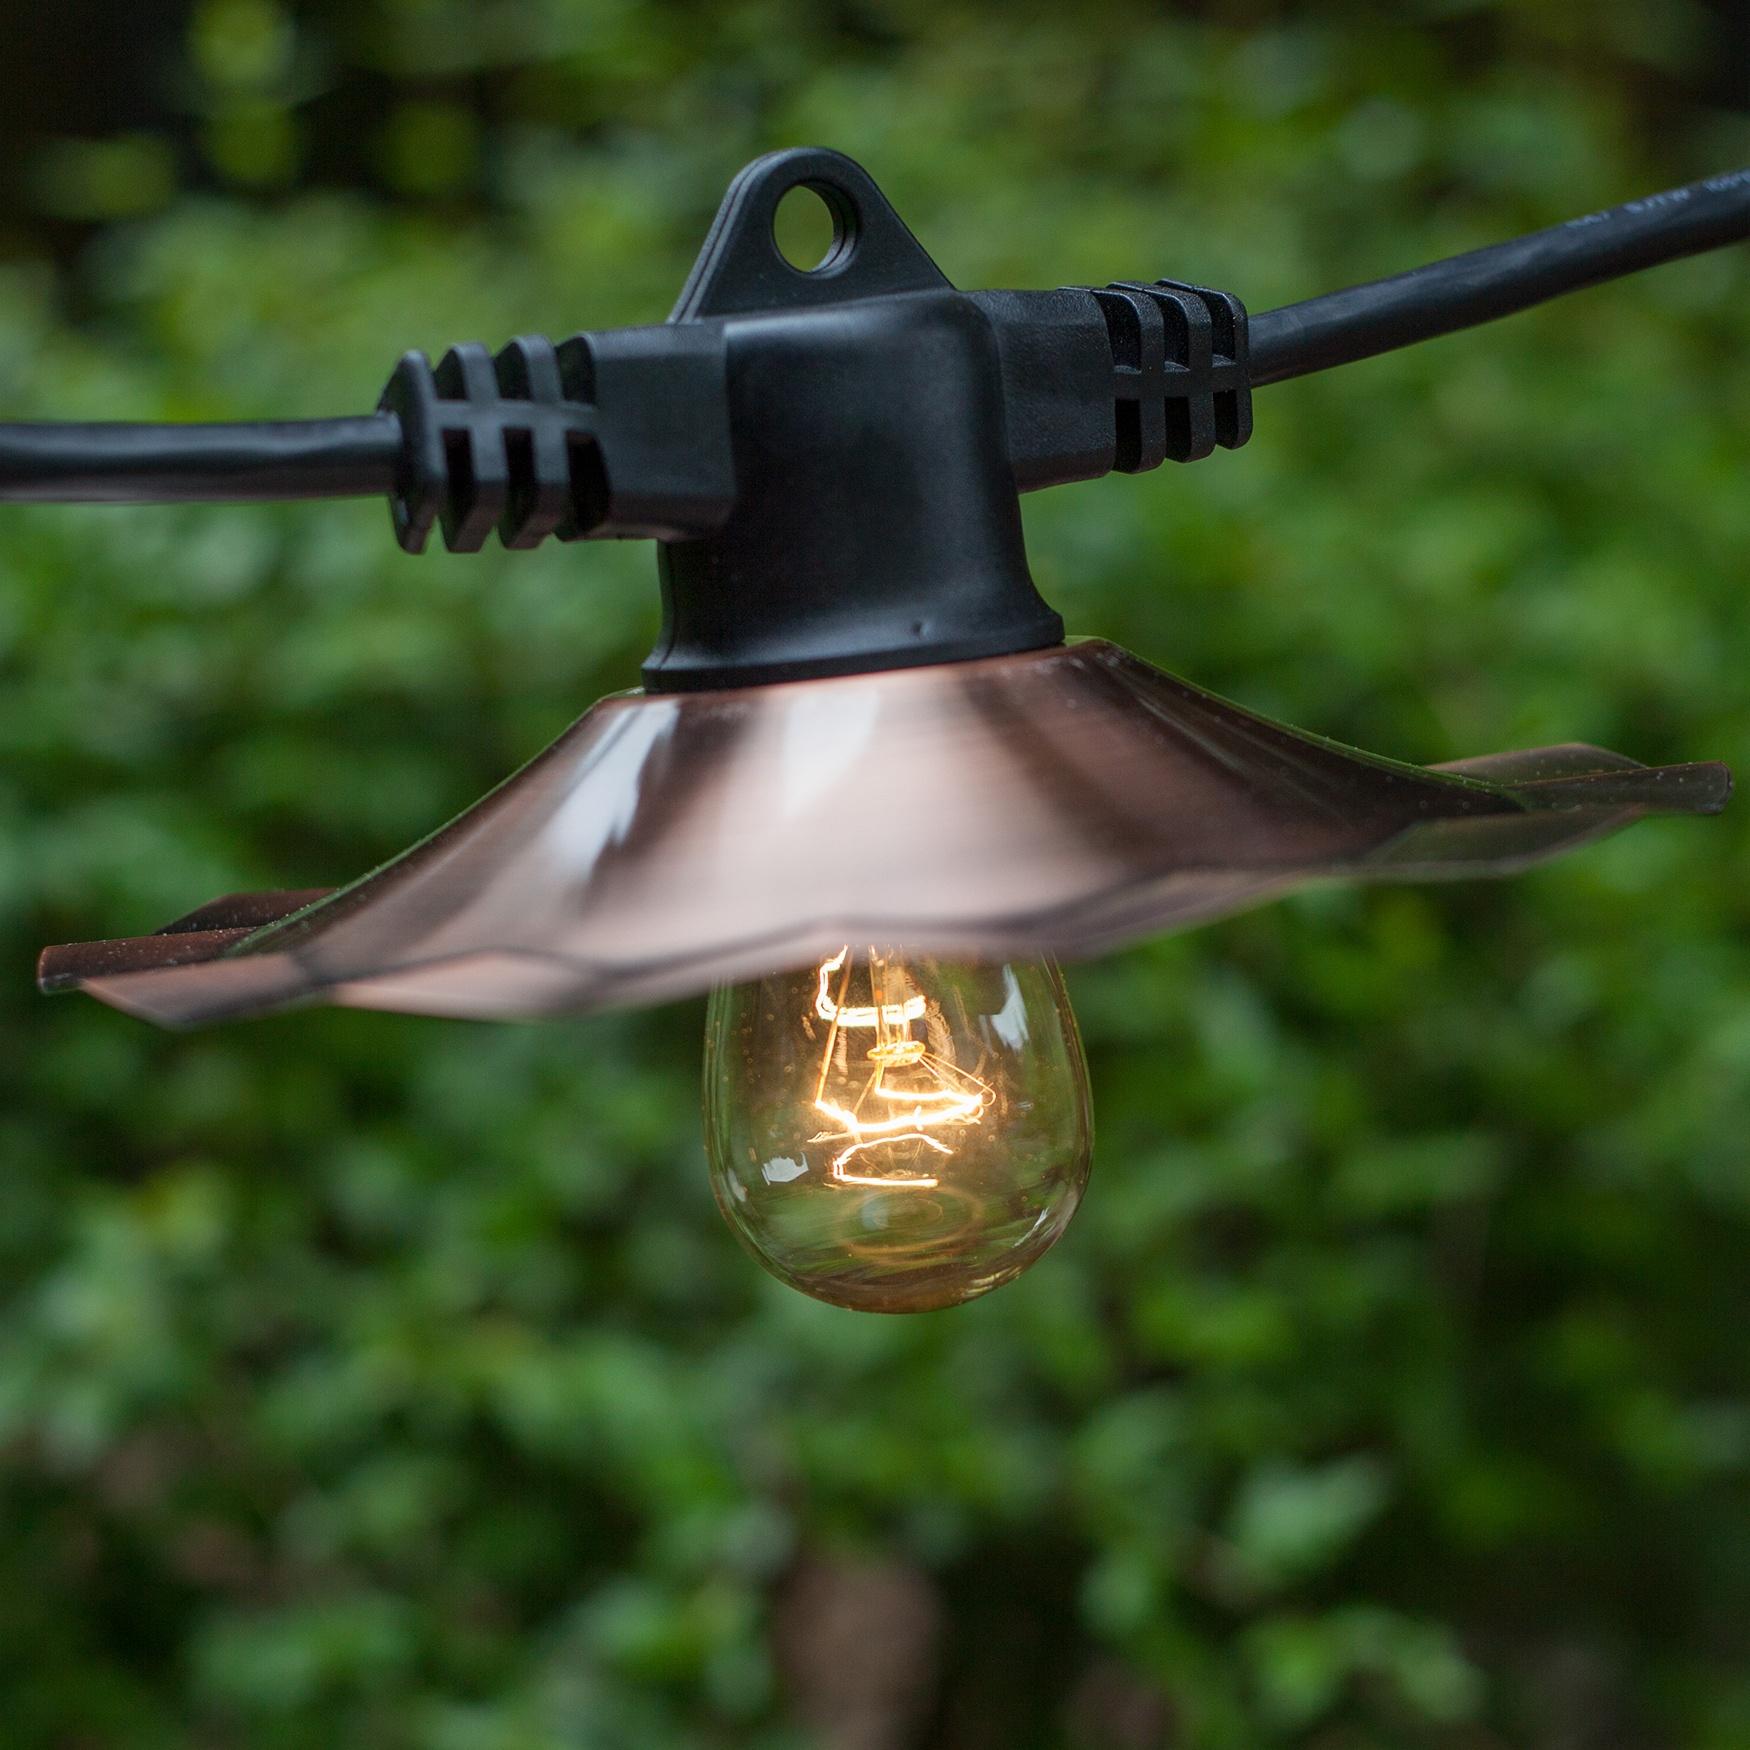 commercial patio lights. 35\u0027 E26 Commercial Patio Light Stringer, SJTW Black Wire, 60\ Lights R